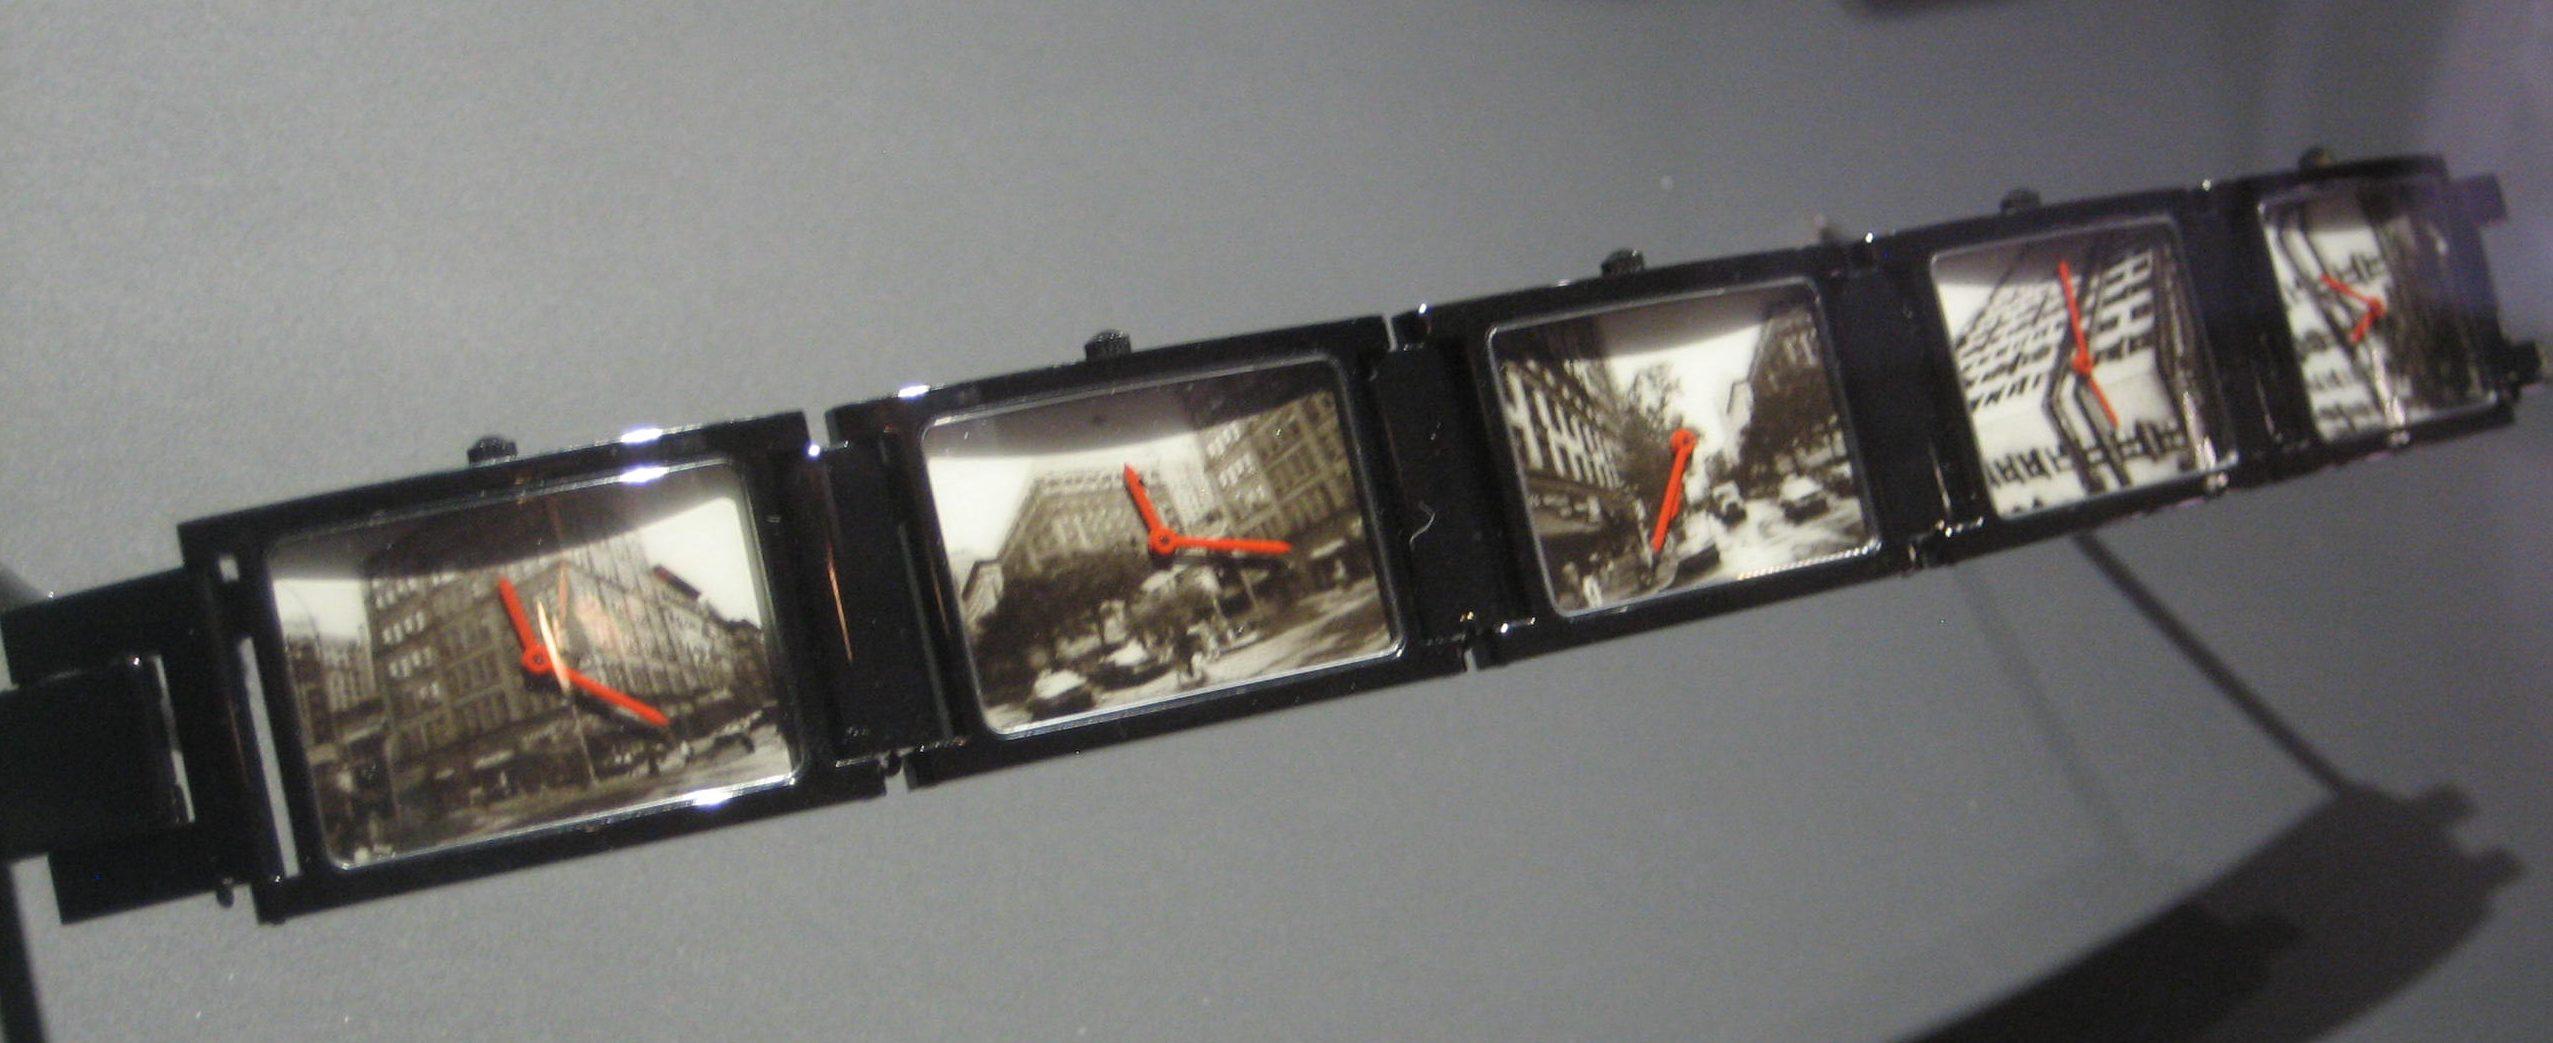 Andy Warhol, Times 5, horloge, 1988, 225/250. Particuliere collectie. Foto Esther Doornbusch, juni 2018©